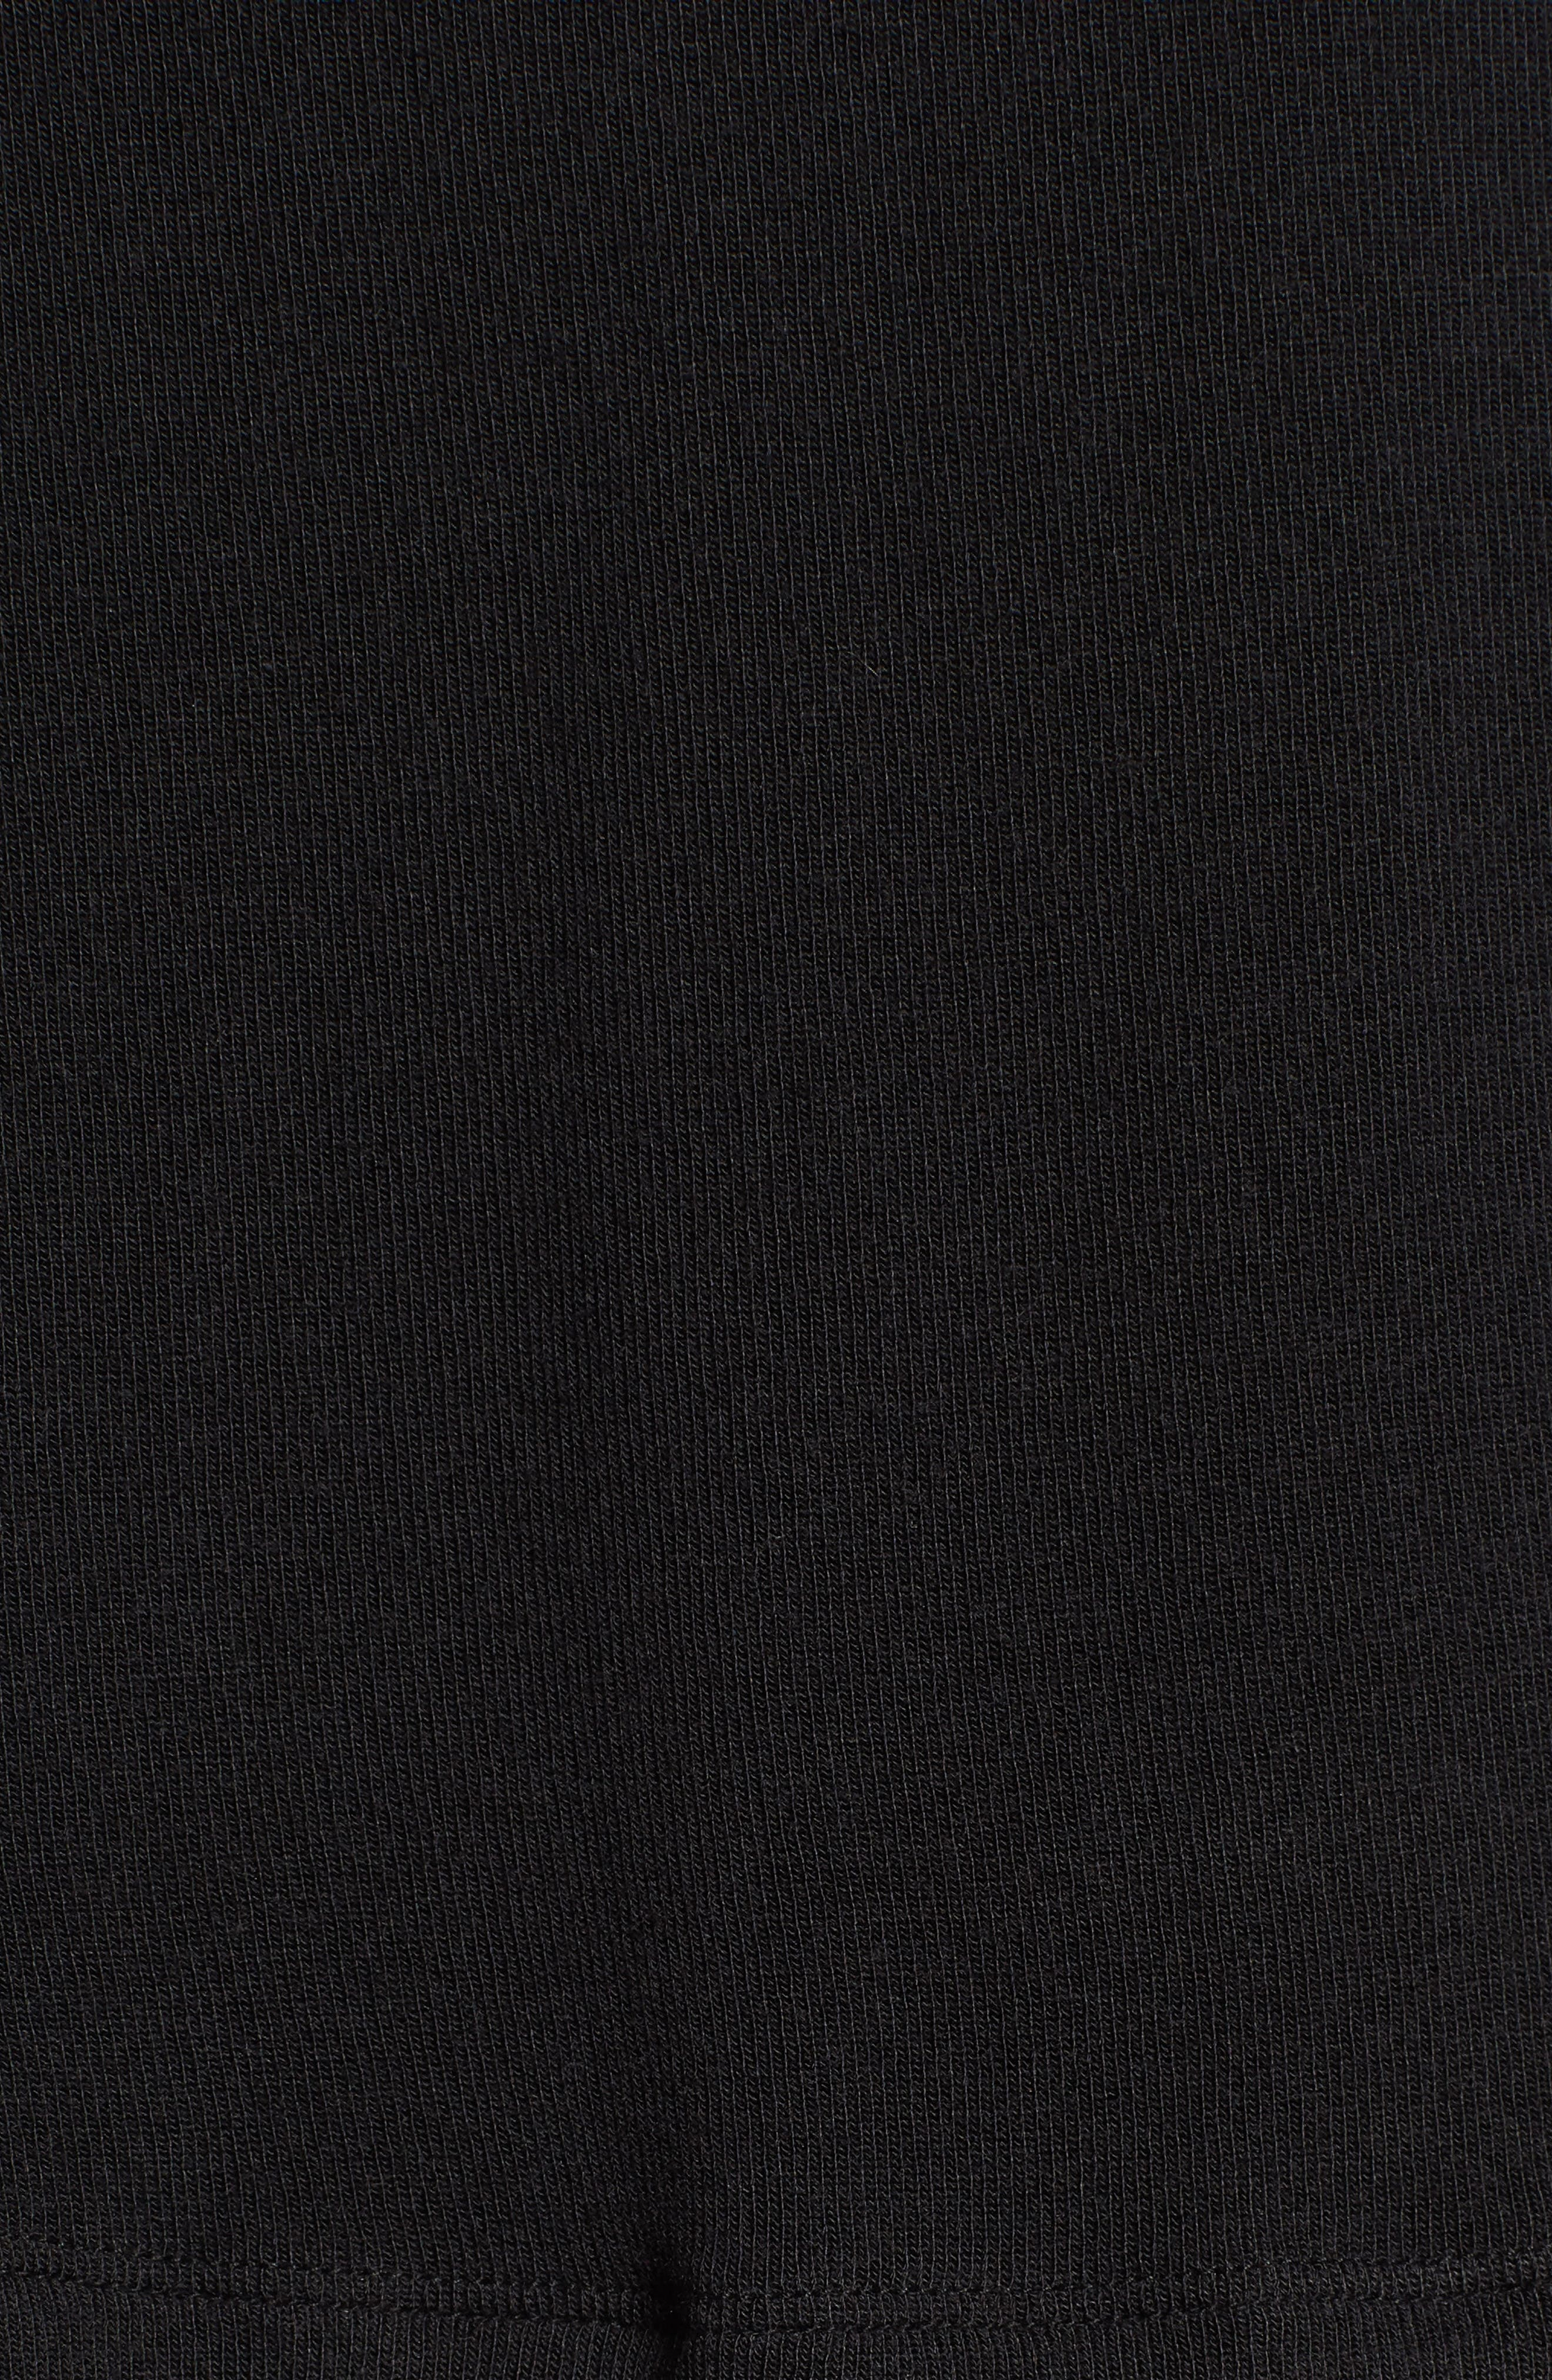 Taiko Lace Trim Top,                             Alternate thumbnail 6, color,                             Black